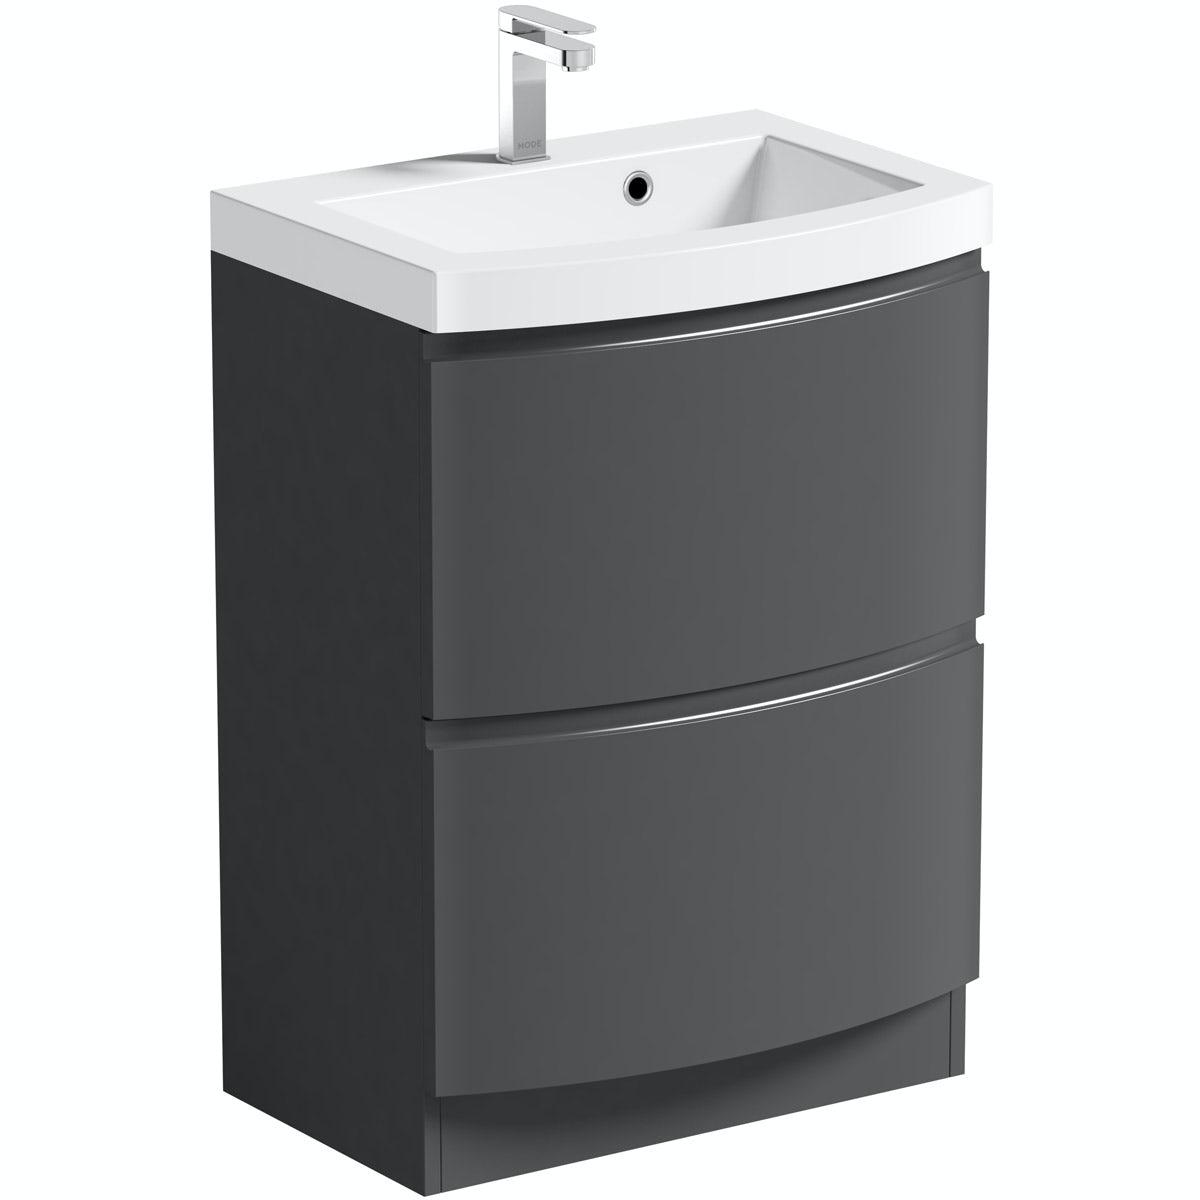 Mode Harrison slate vanity unit and basin 600mm